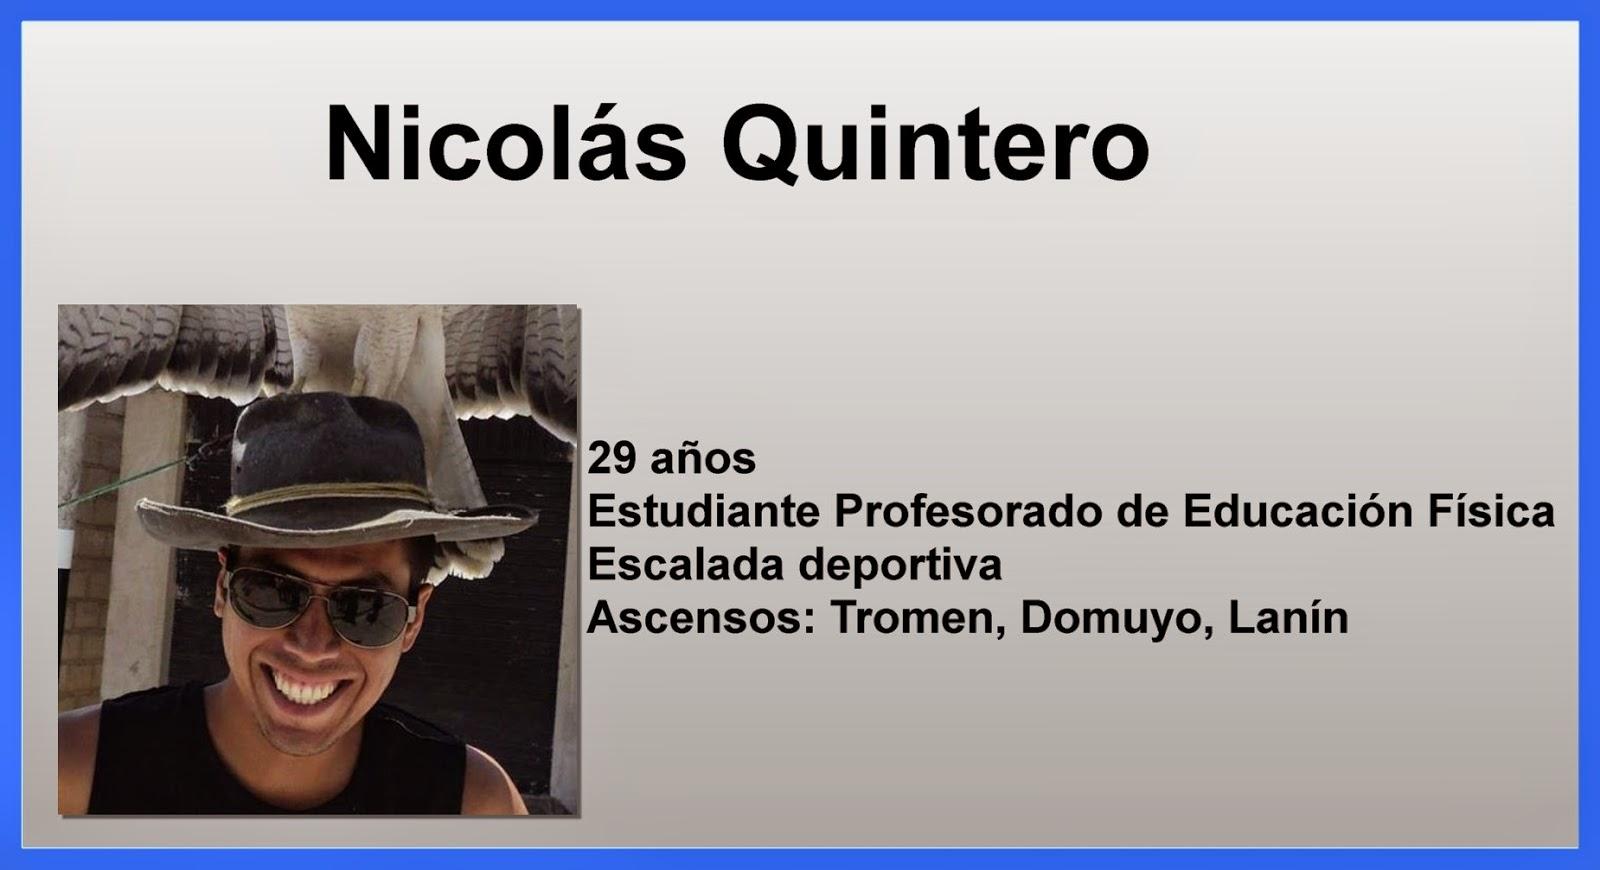 https://www.facebook.com/nicolas.quintero.777?fref=ts